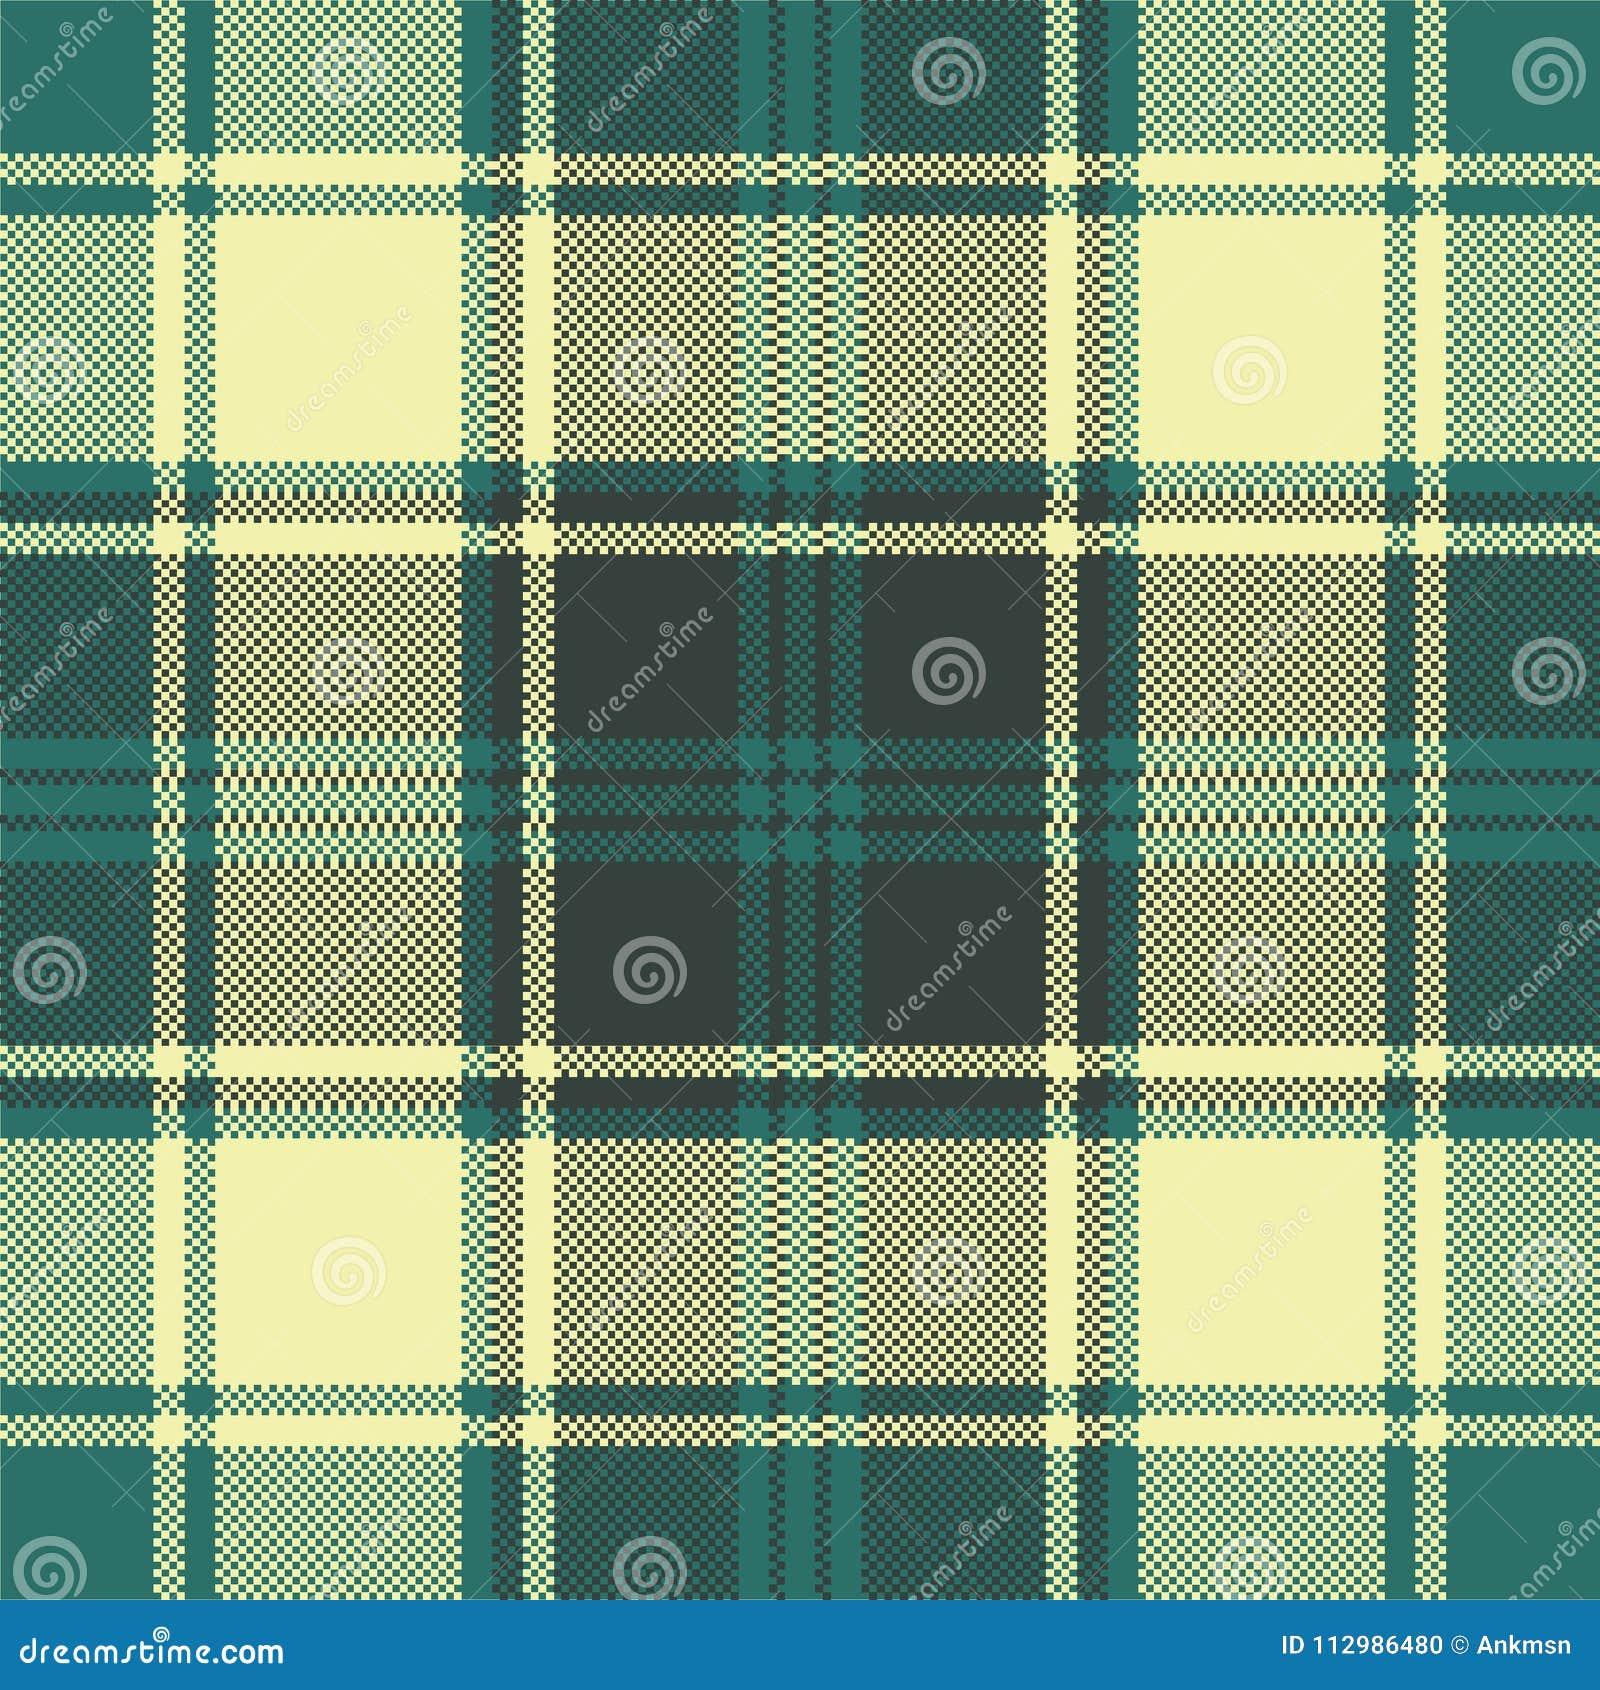 Green yellow plaid check pixel seamless pattern